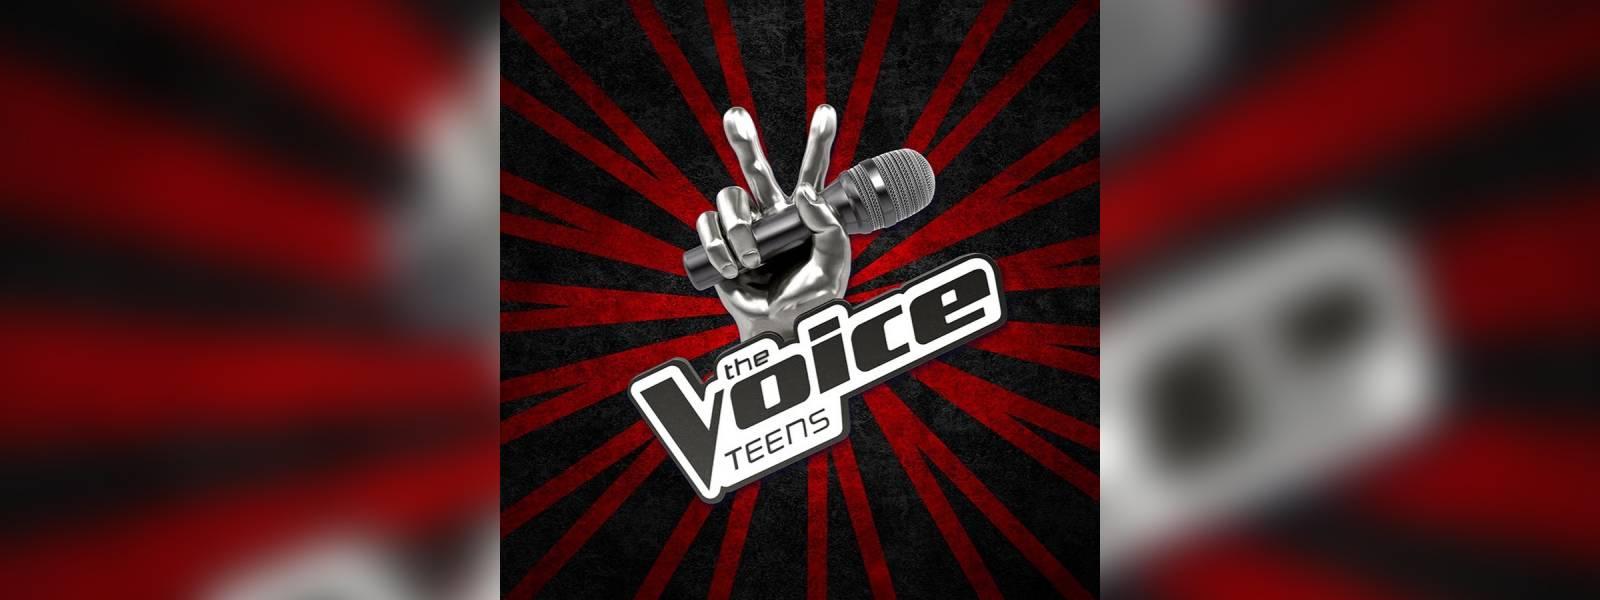 Voice Teens on Sirasa TV nears final stage